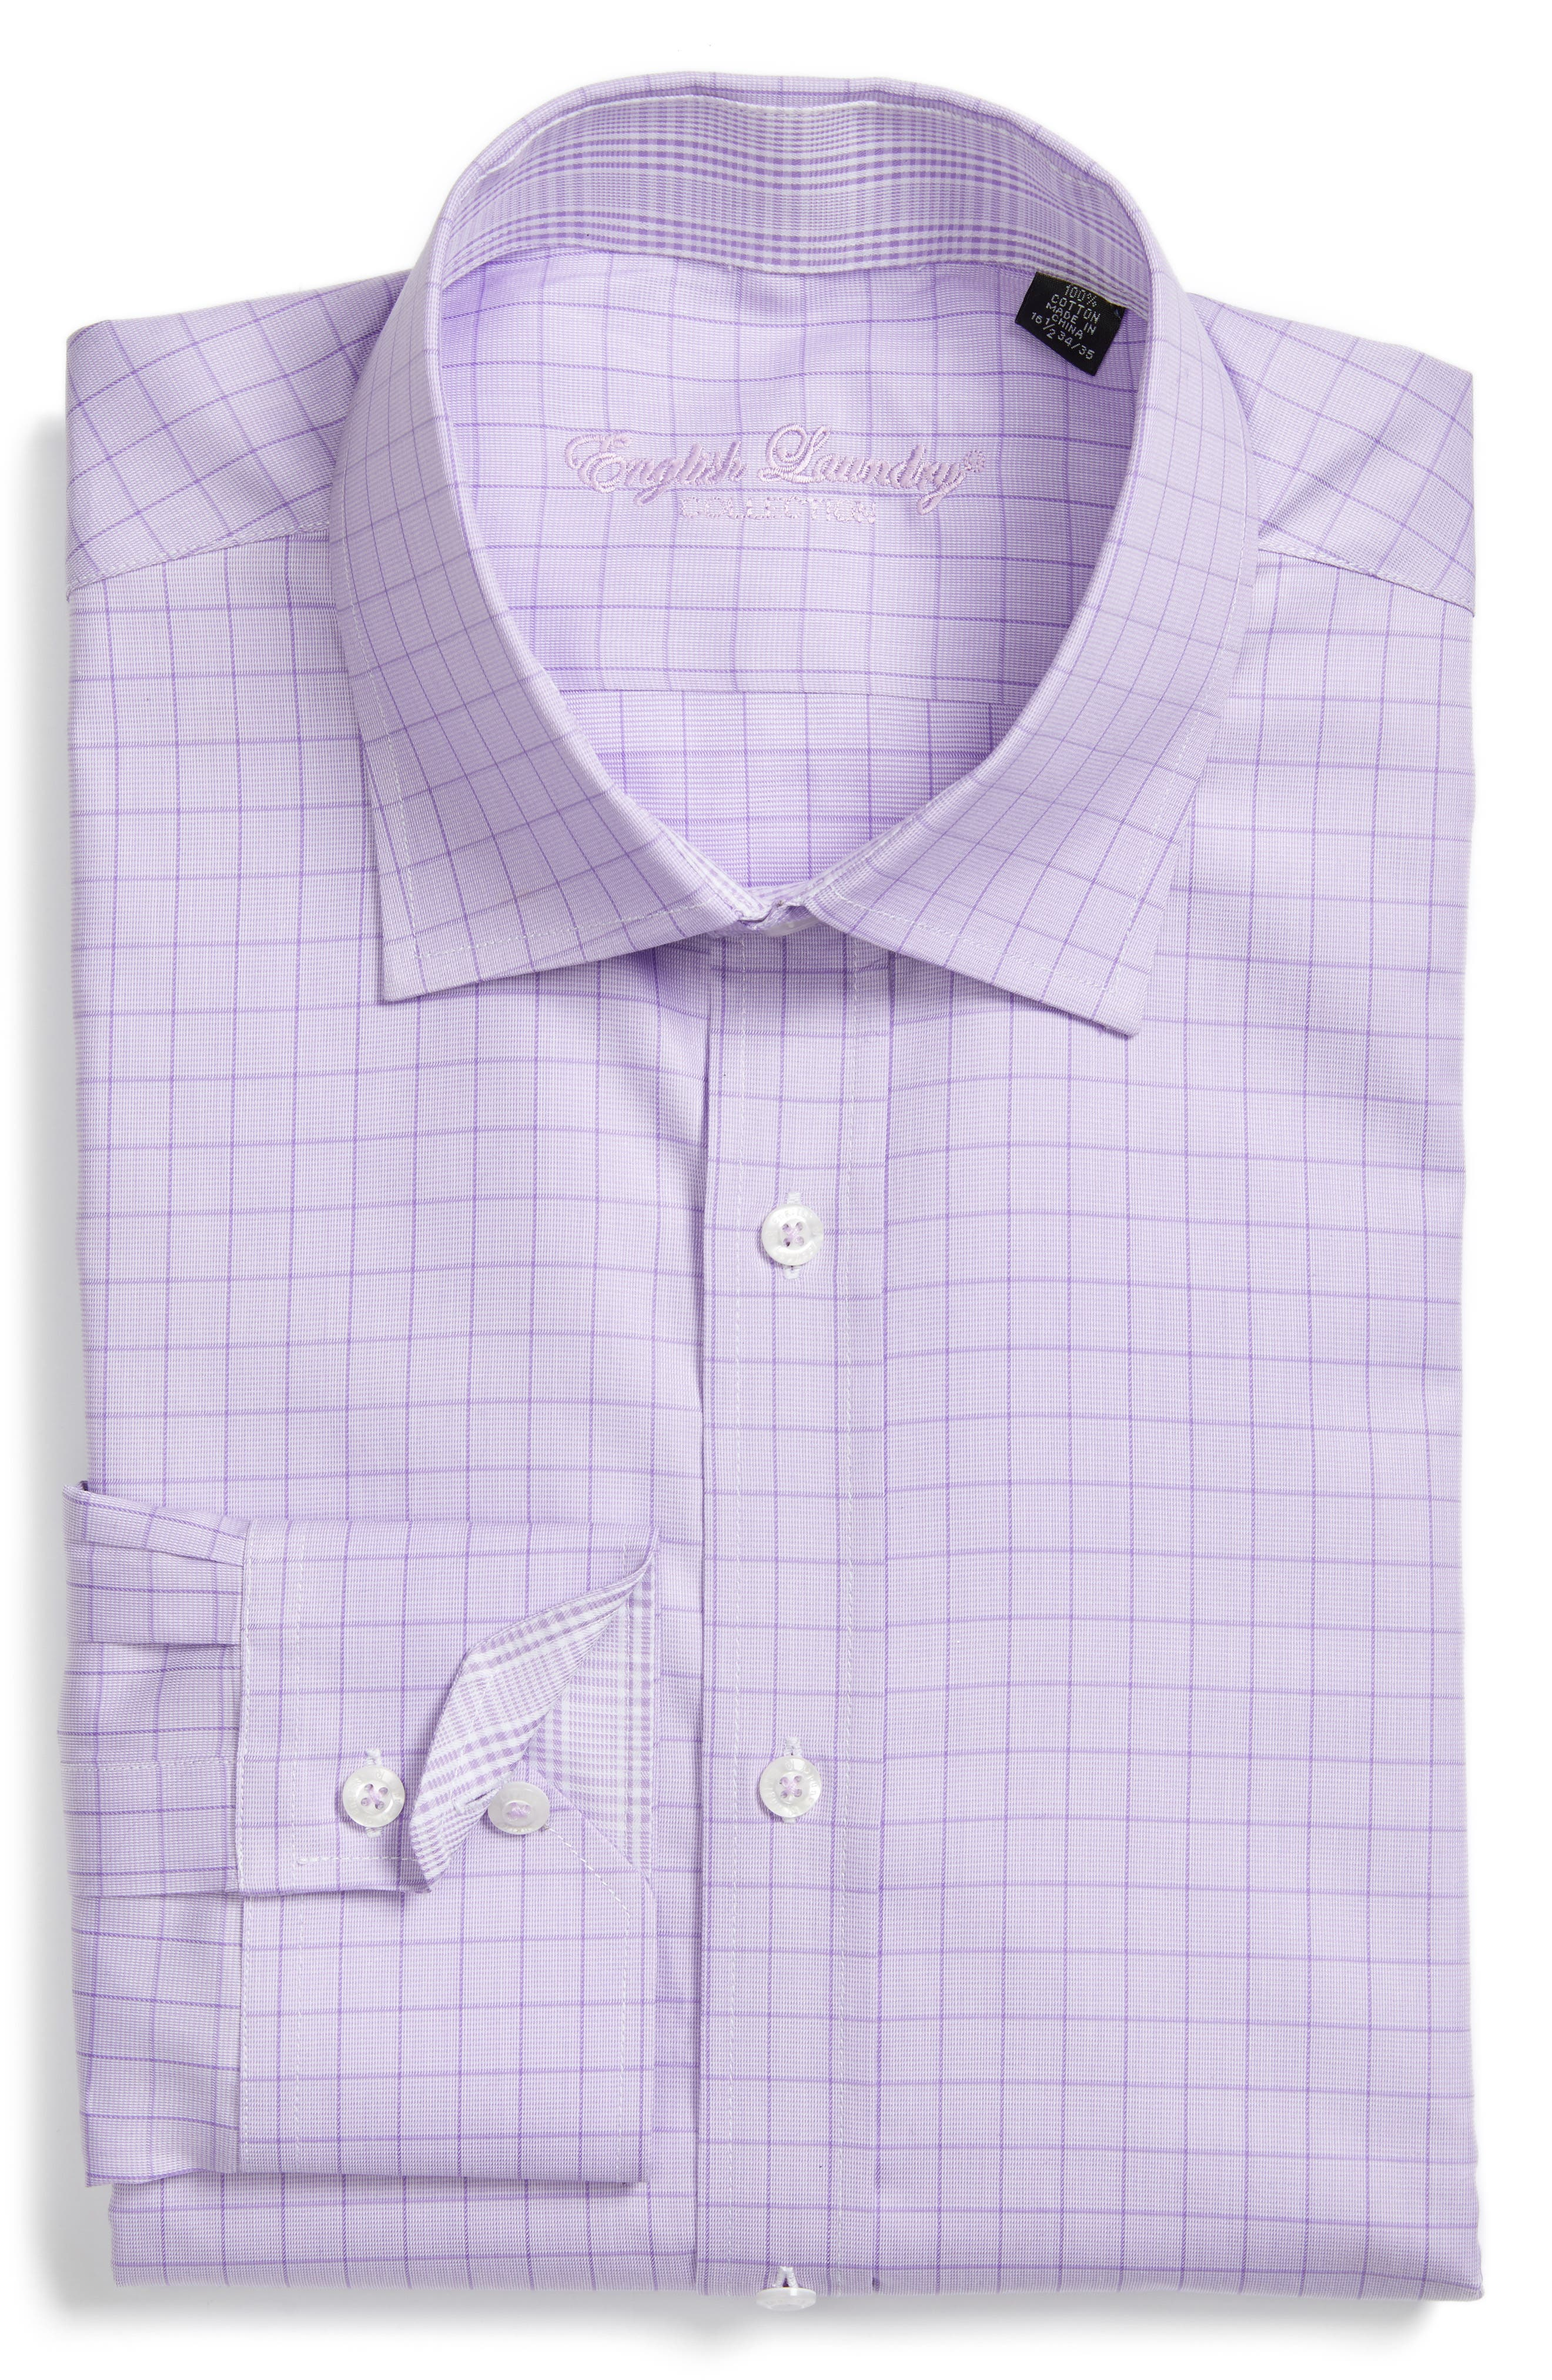 Trim Fit Check Dress Shirt,                         Main,                         color, 540